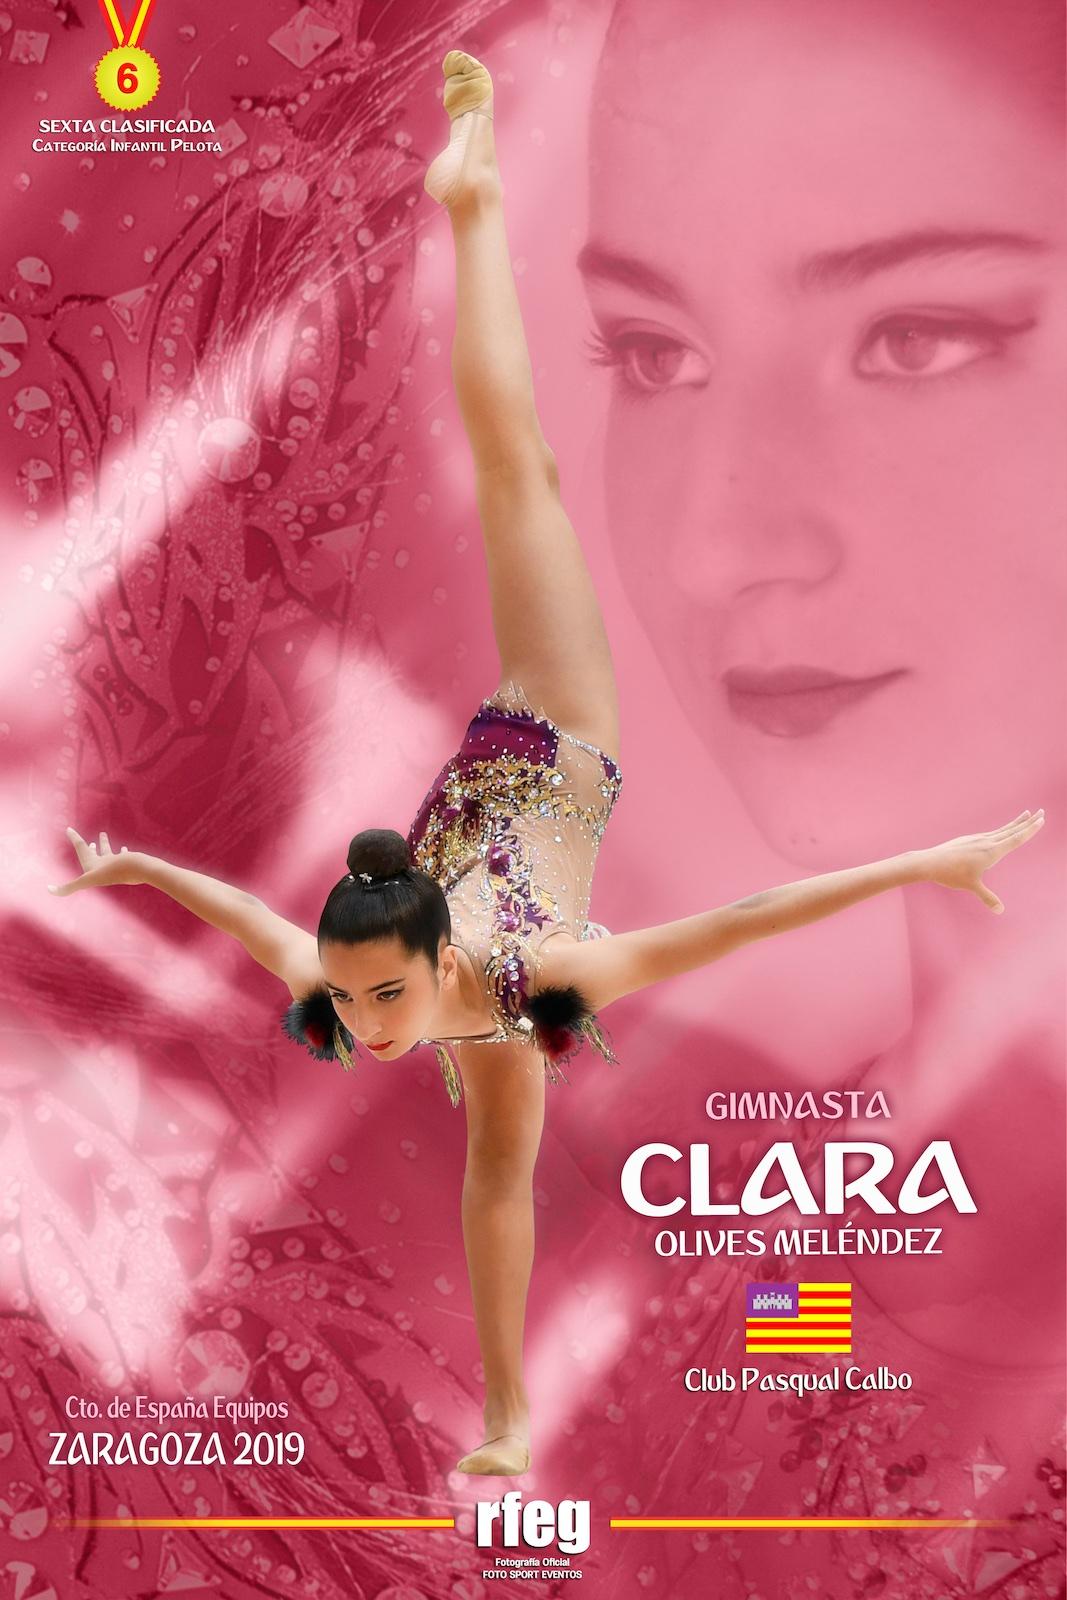 CLARA OLIVES